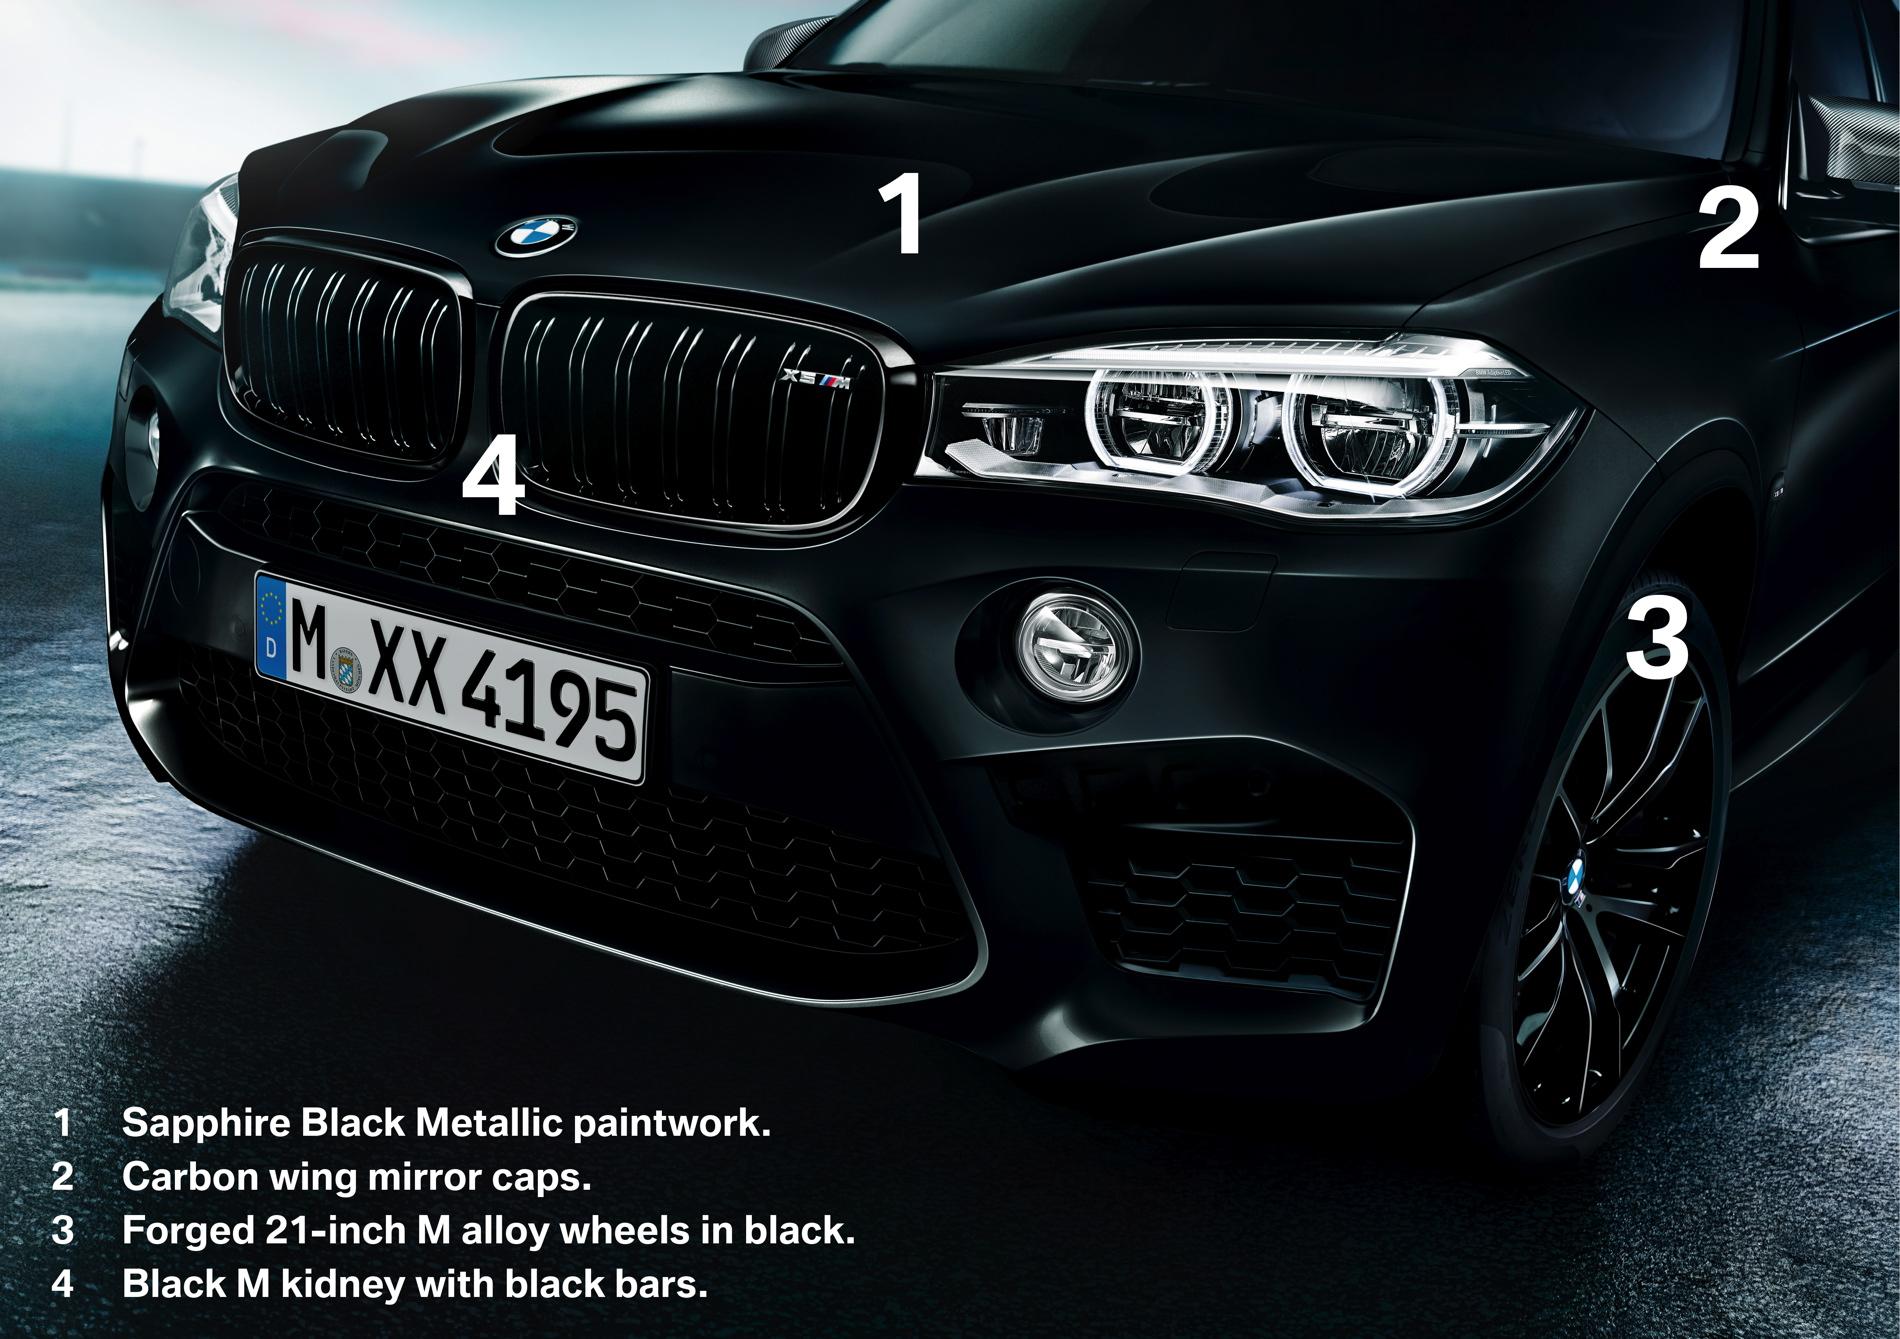 BMW X6M Black Fire Edition 02 830x585 ...